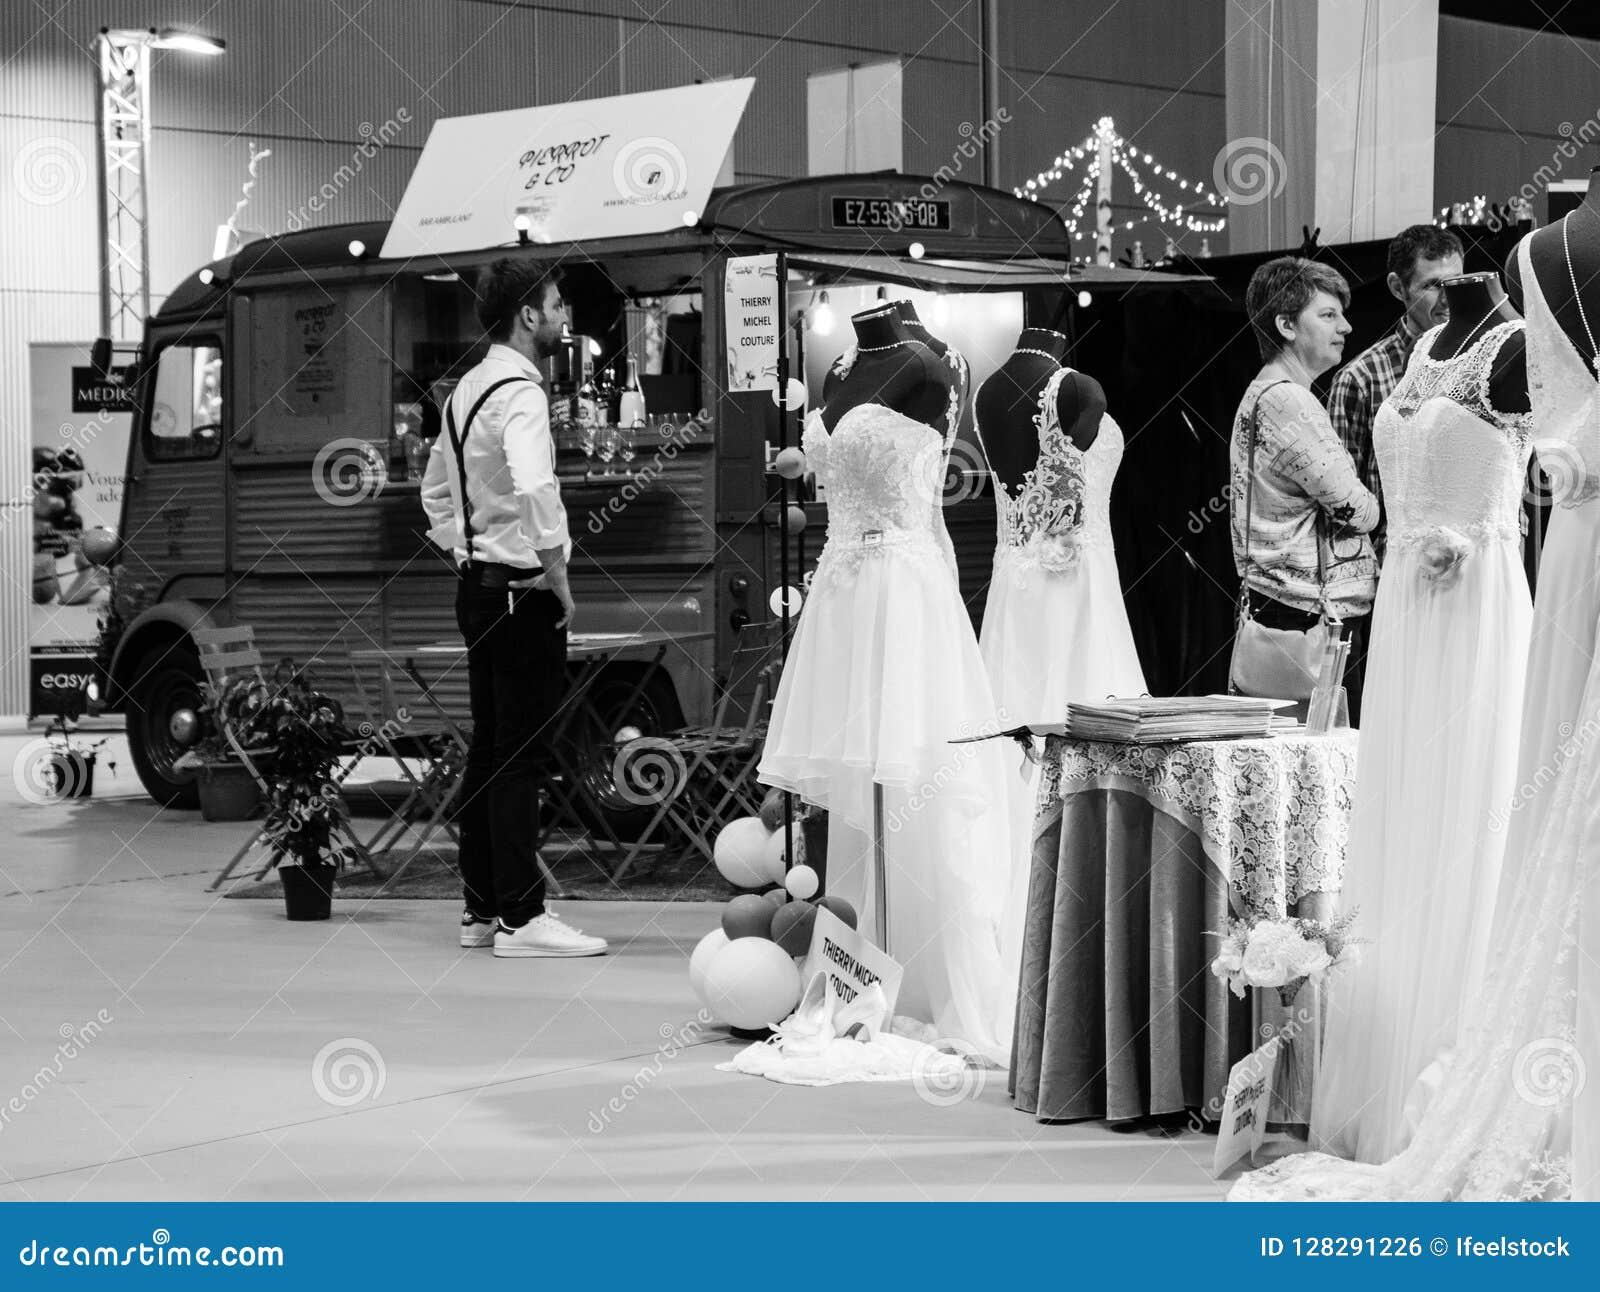 Wedding Exhibition Paris 2018 Food Truck And Vintage Dresses